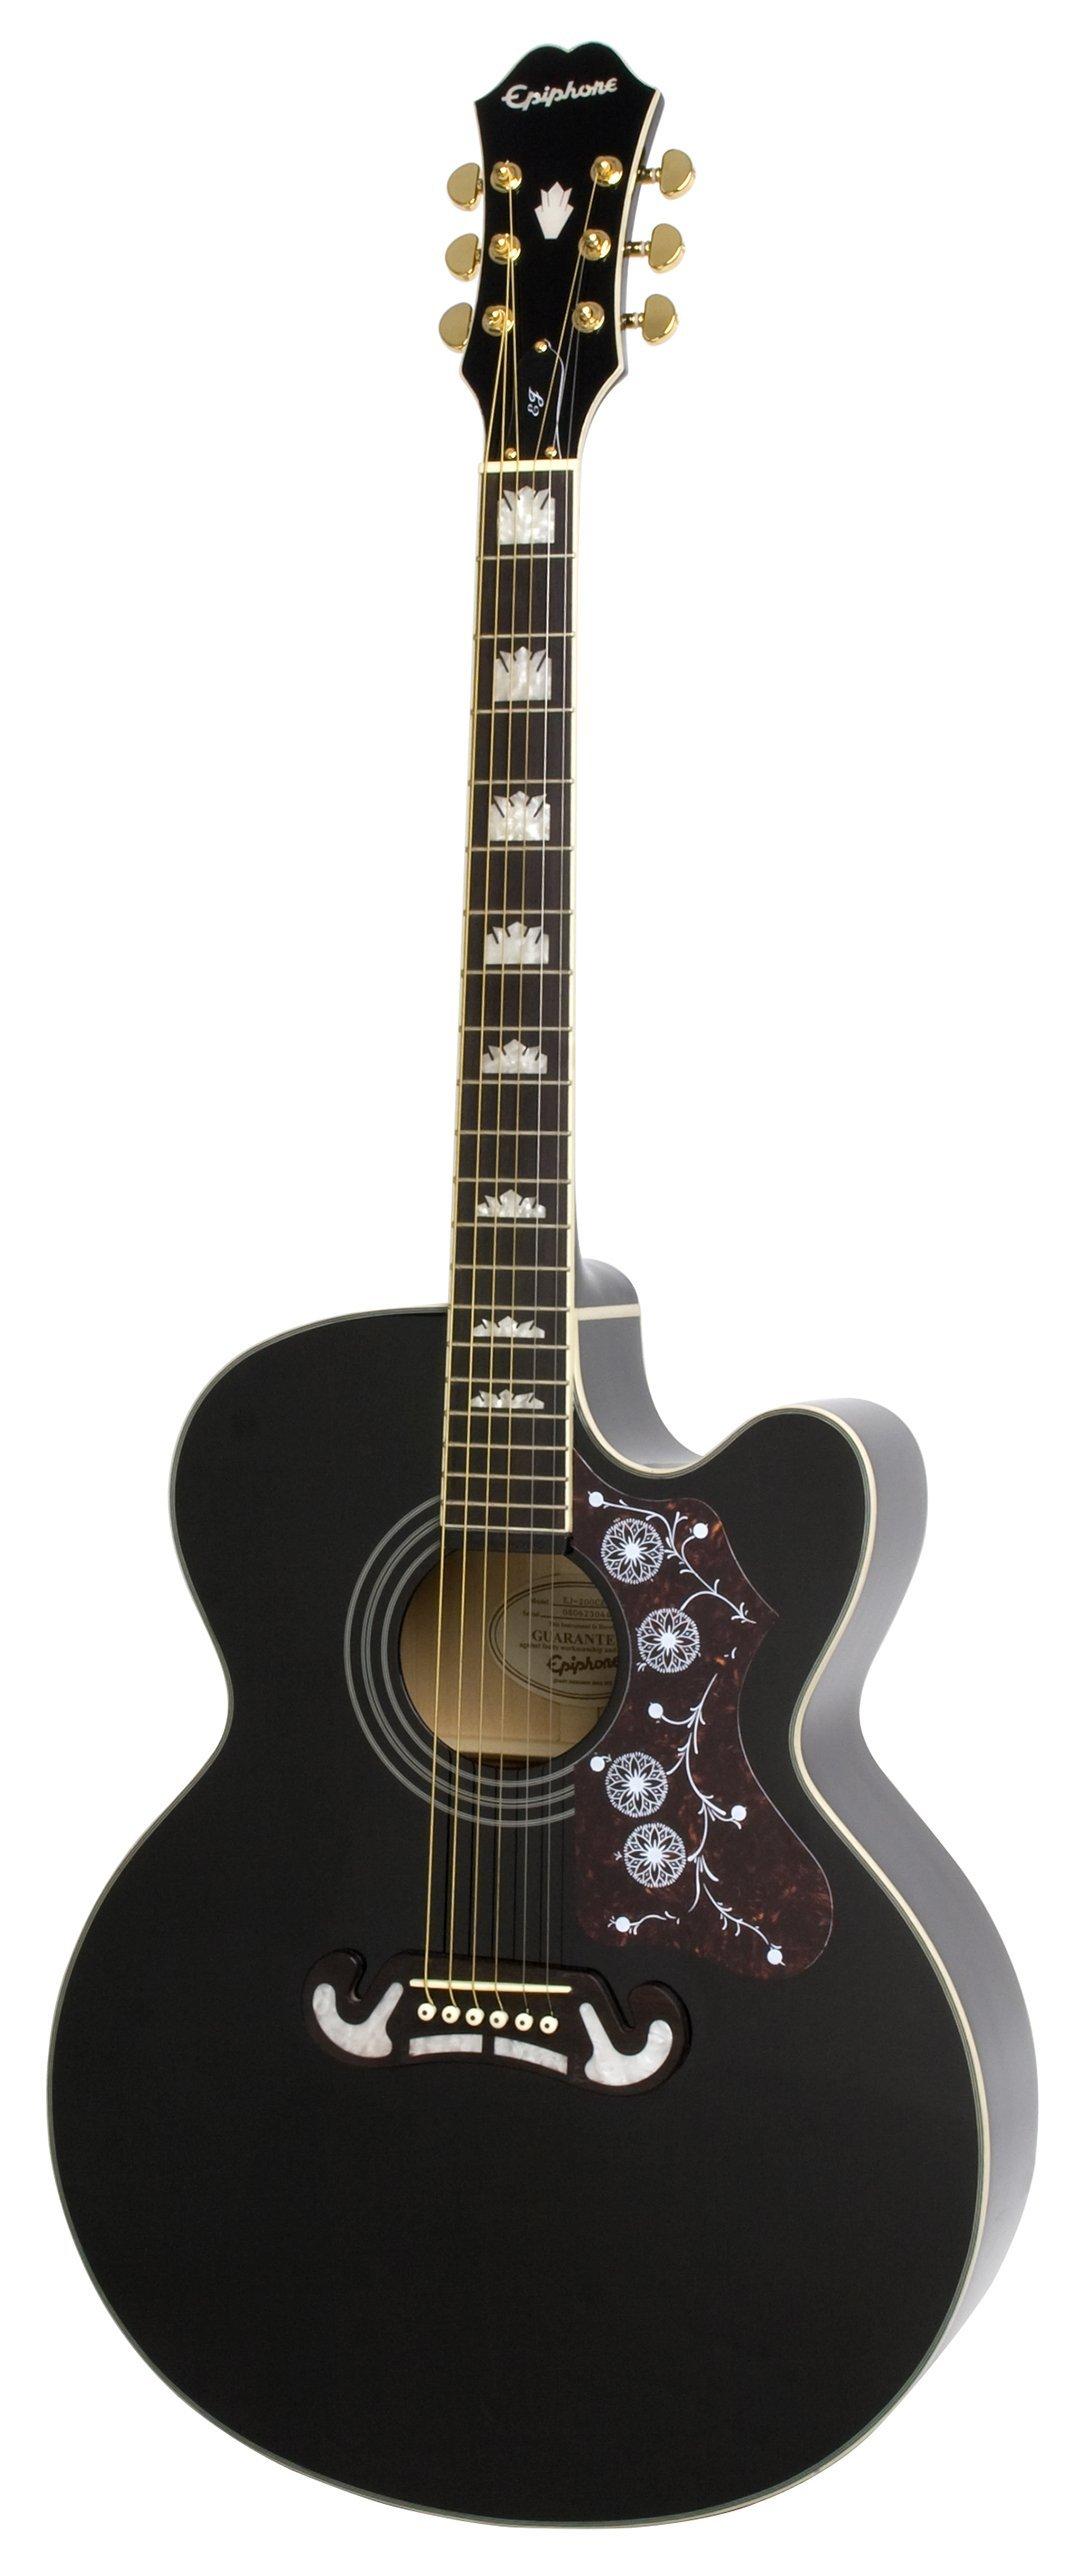 Cheap EJ-200CE Acoustic/Elec Guitar in Black Black Friday & Cyber Monday 2019